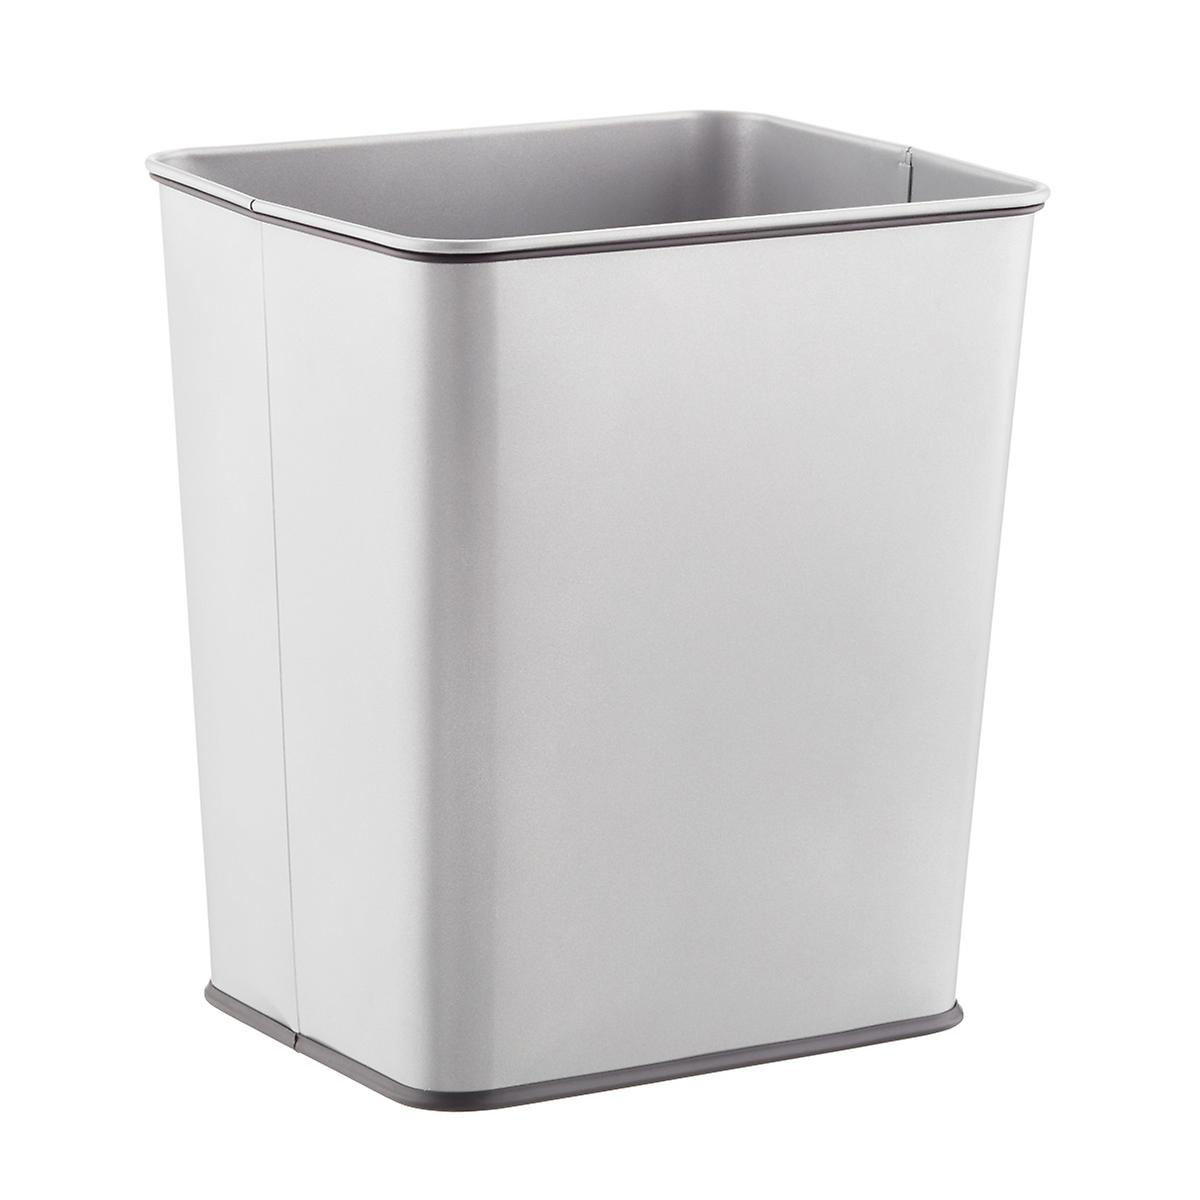 Polder Silver 7 gal. Rectangular Undercounter Trash Can